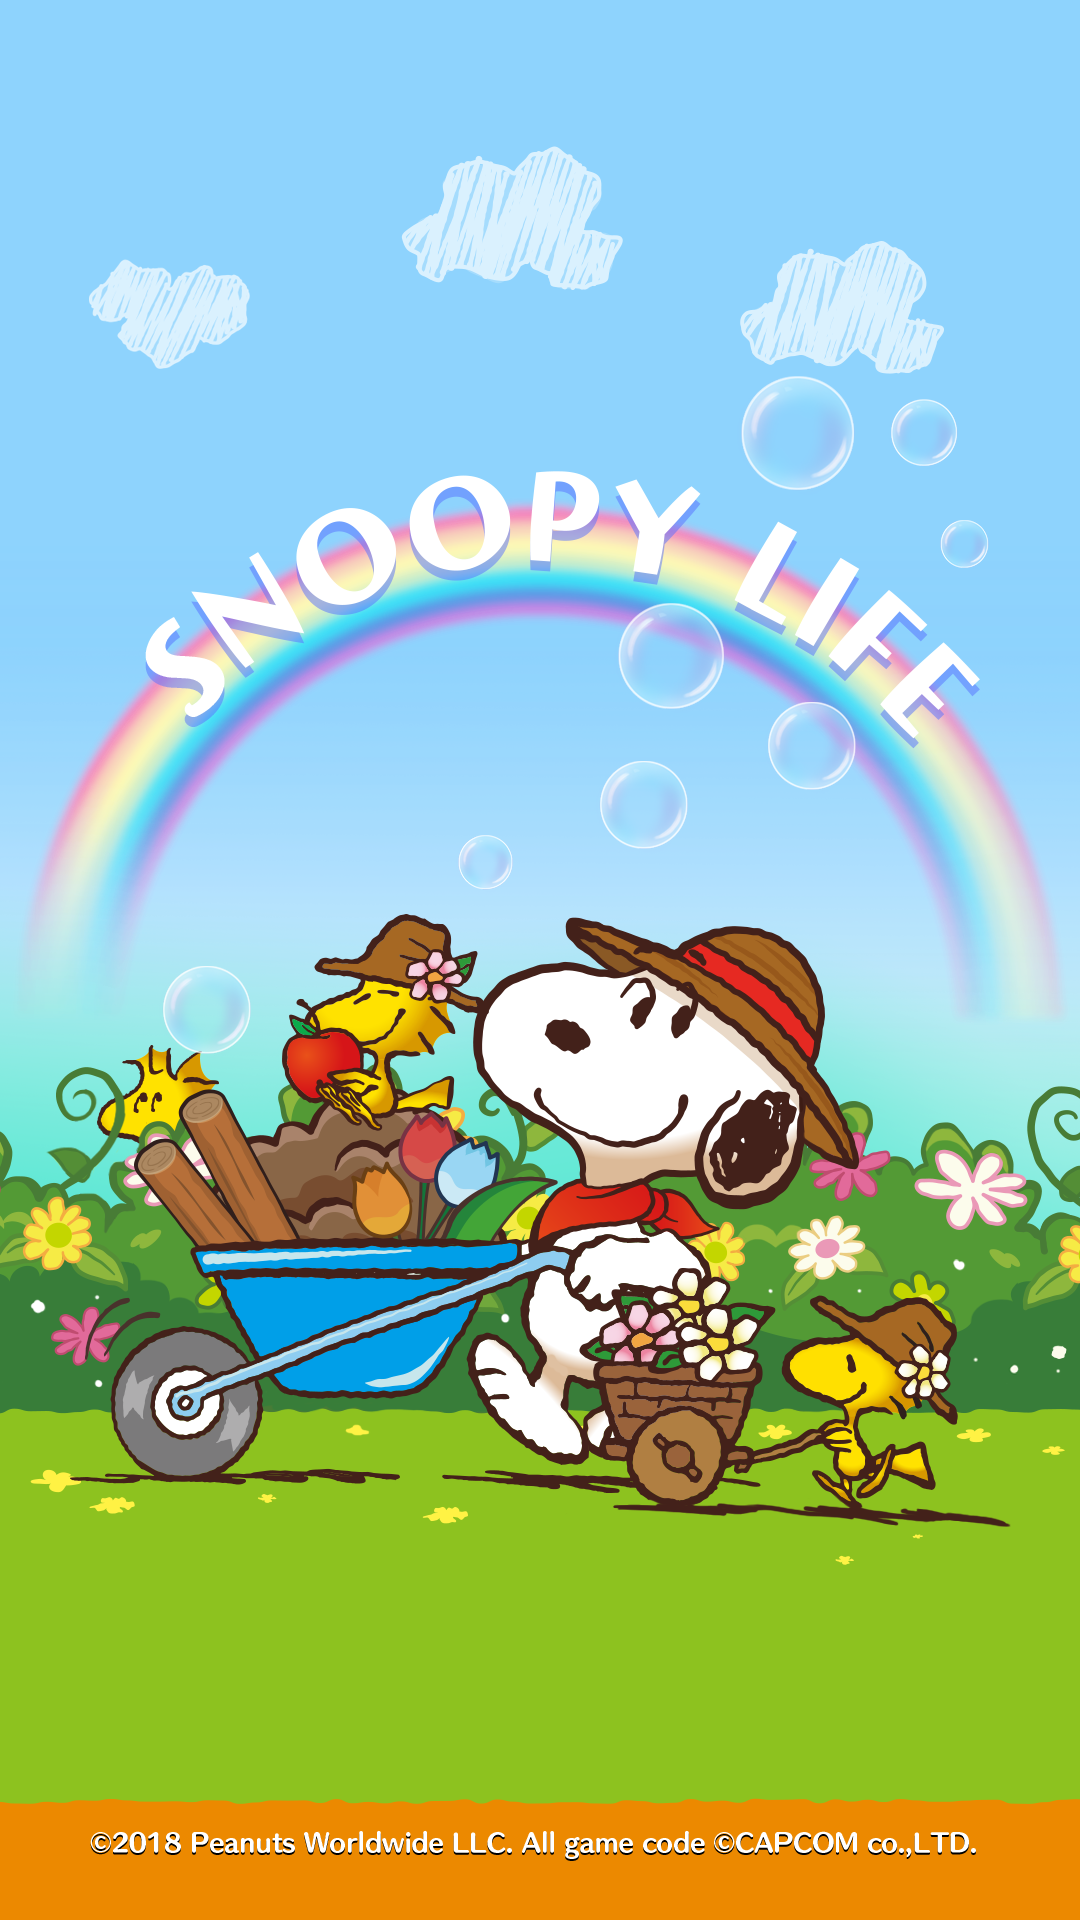 Pin on Snoopy